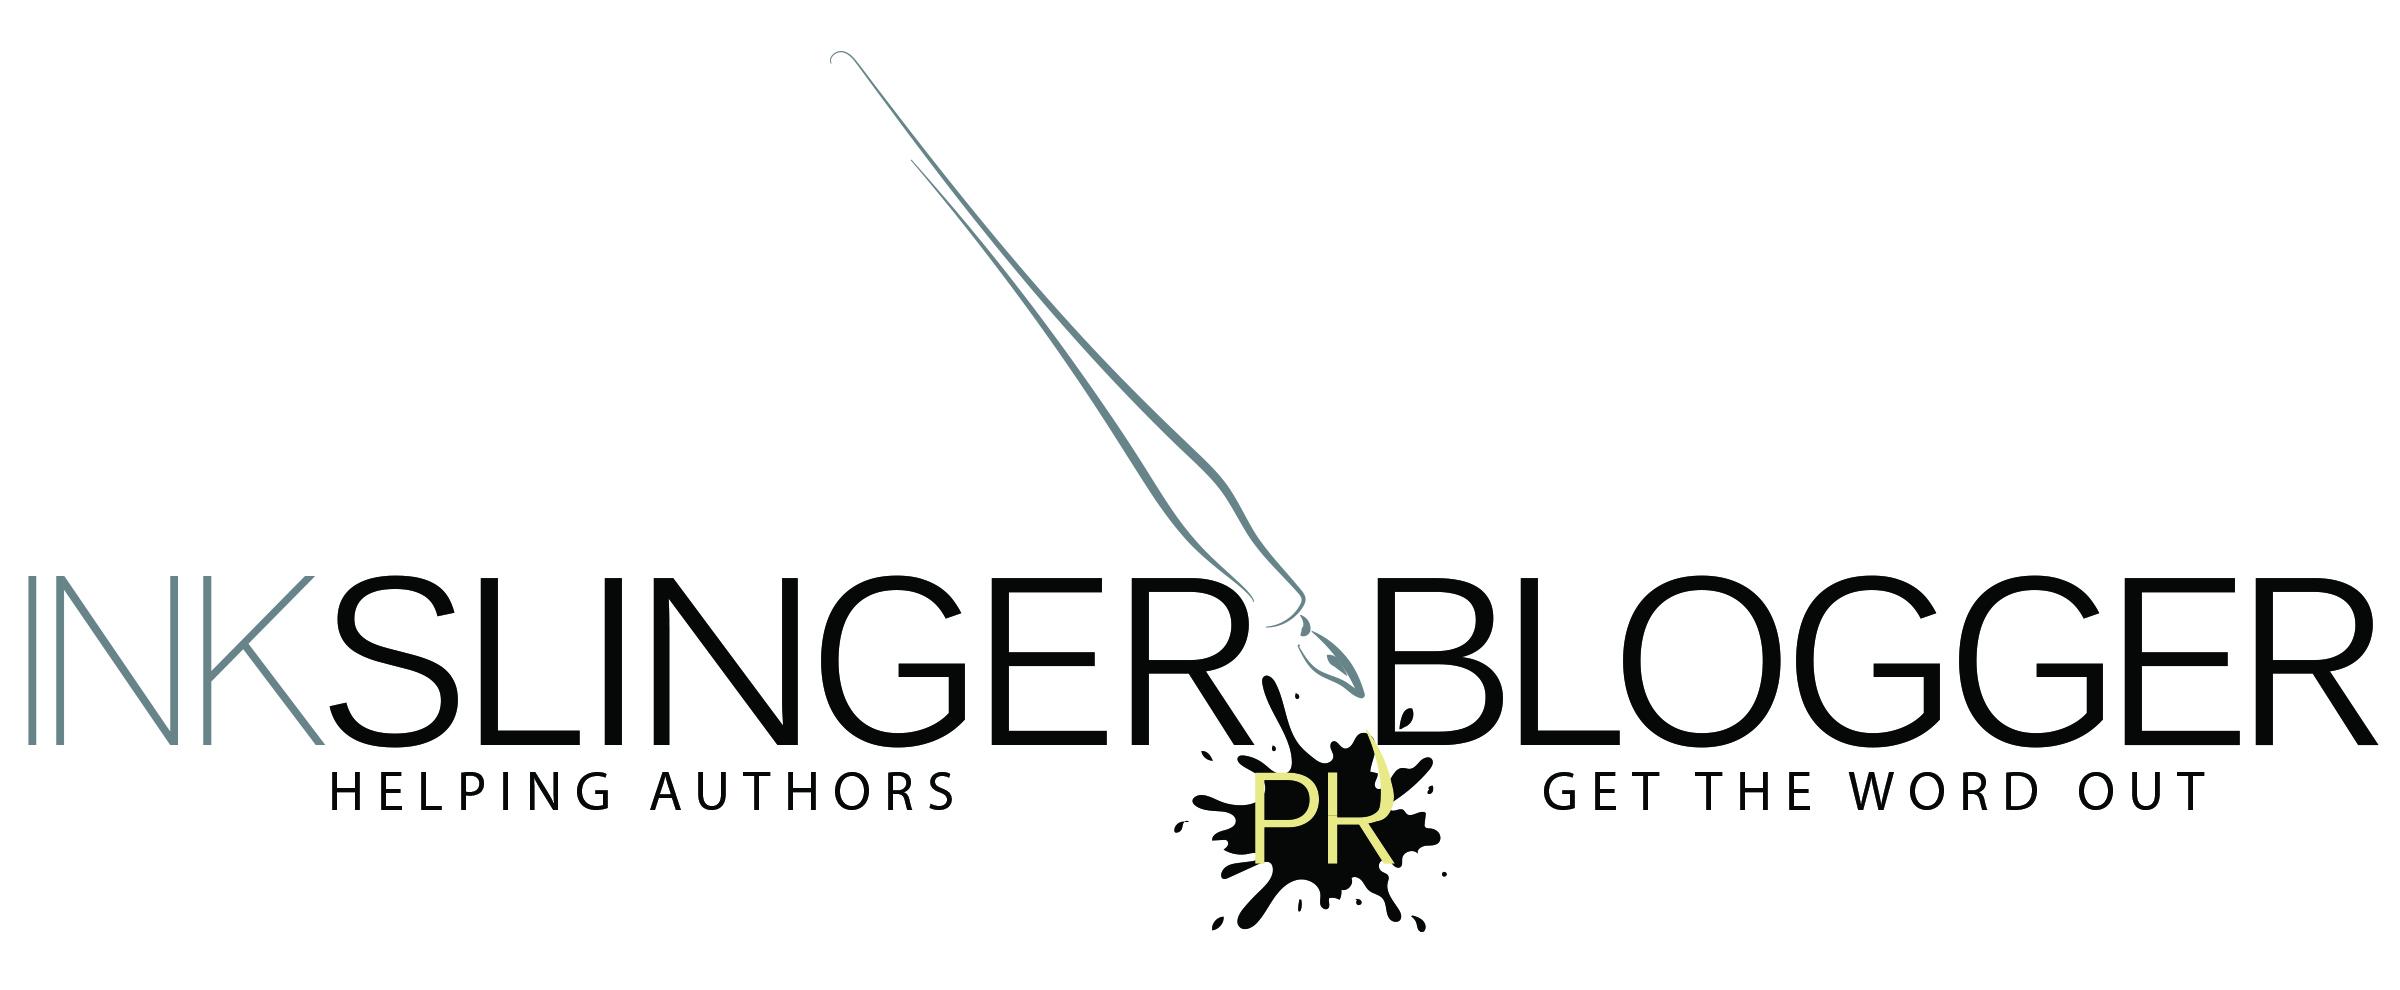 inkslinger blogger final[3189]